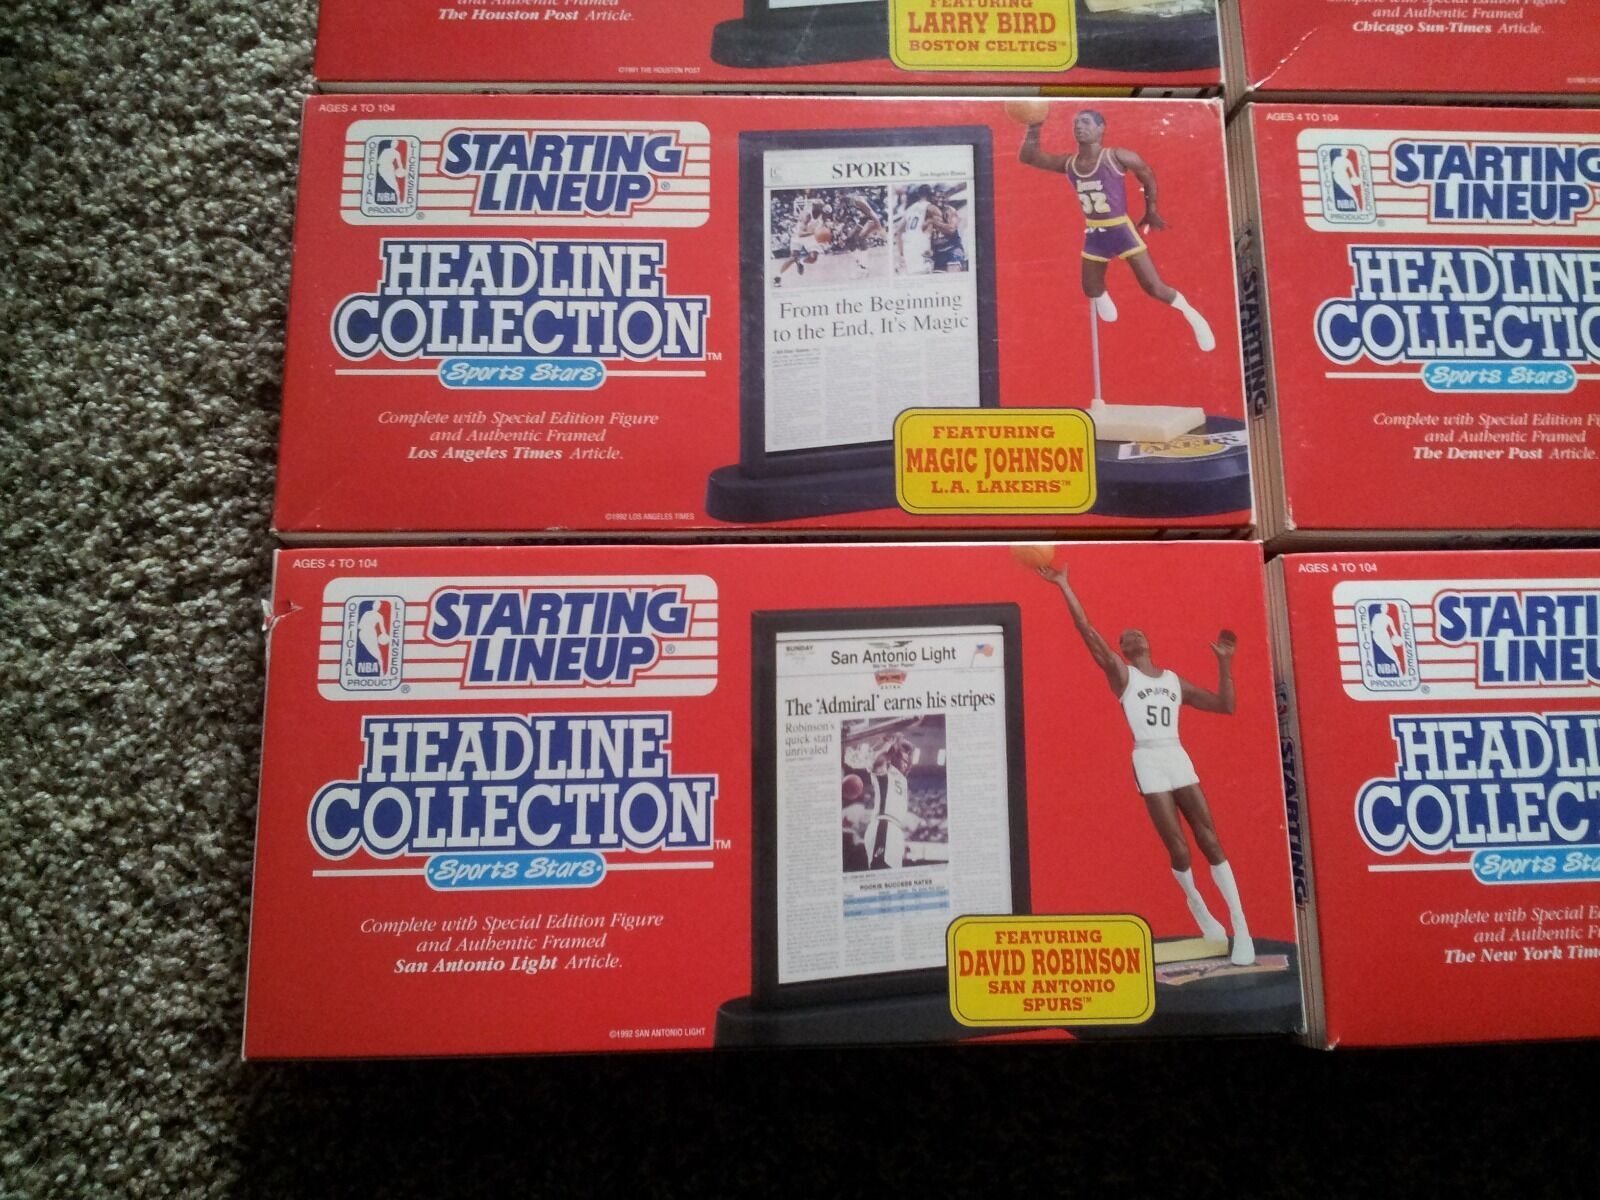 1992 Starting Lineup Headline Collection NBA New Bird, Barkley, Barkley, Barkley, Pippen, Ewing 34a3ad